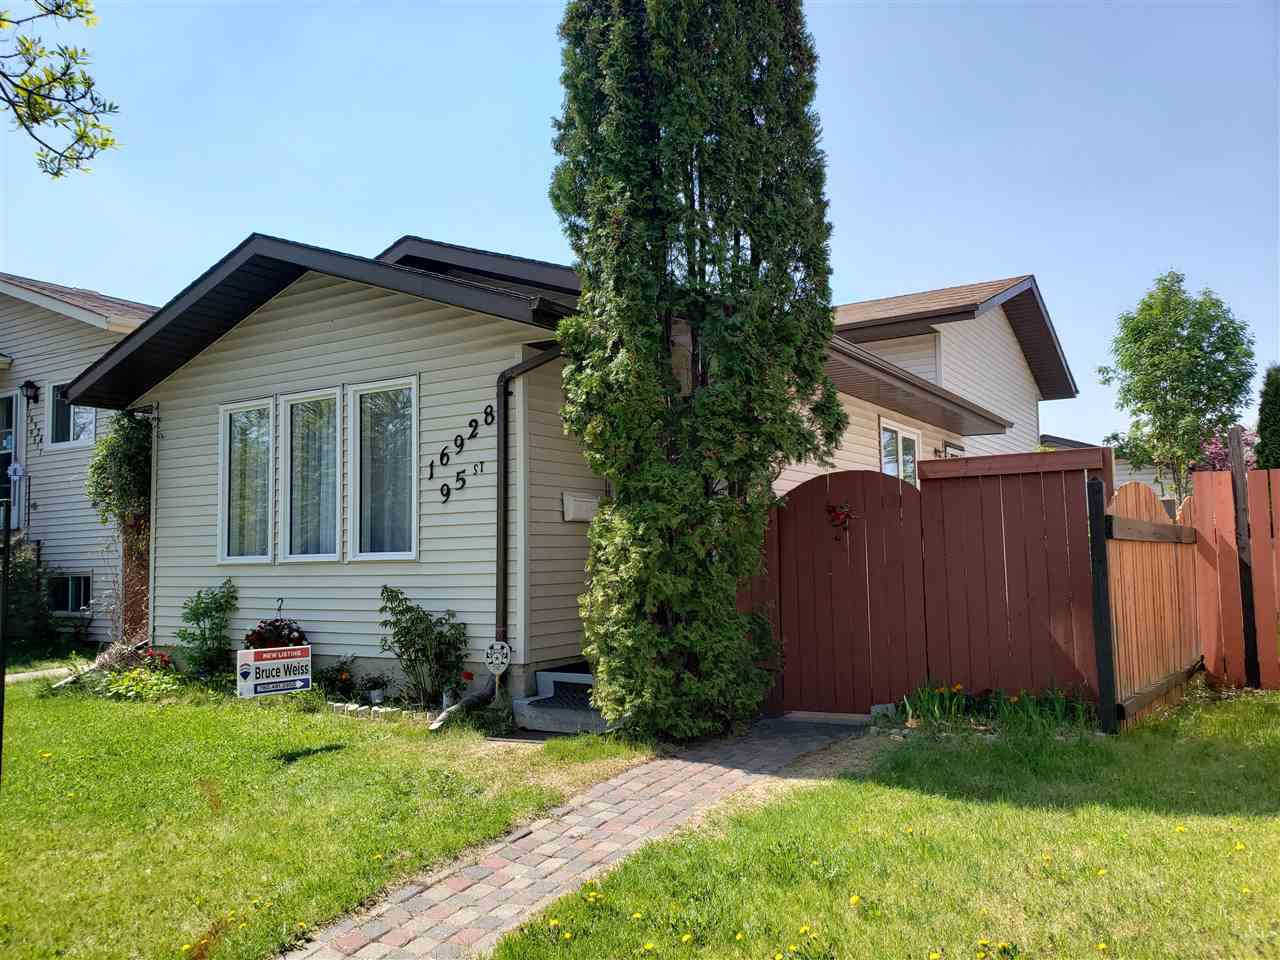 Main Photo: 16928 95 Street in Edmonton: Zone 28 House for sale : MLS®# E4158500